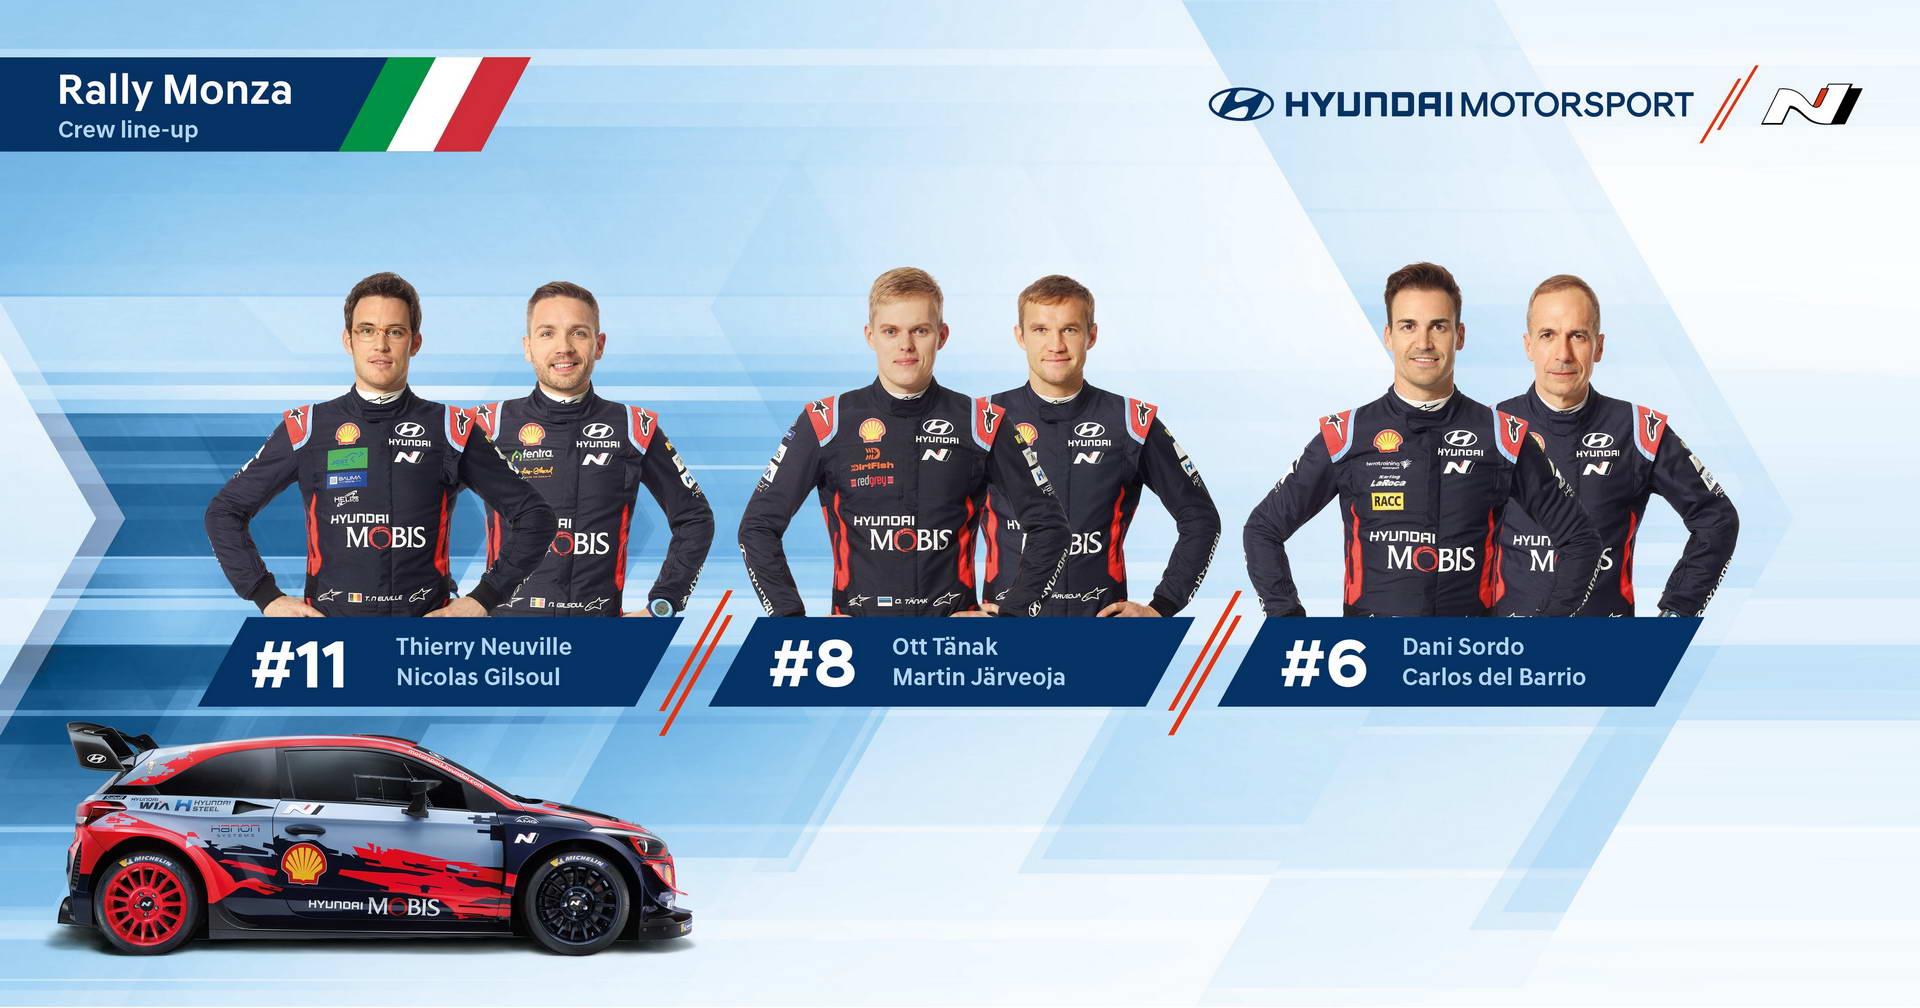 Monza Rally - Hyundai Lineup